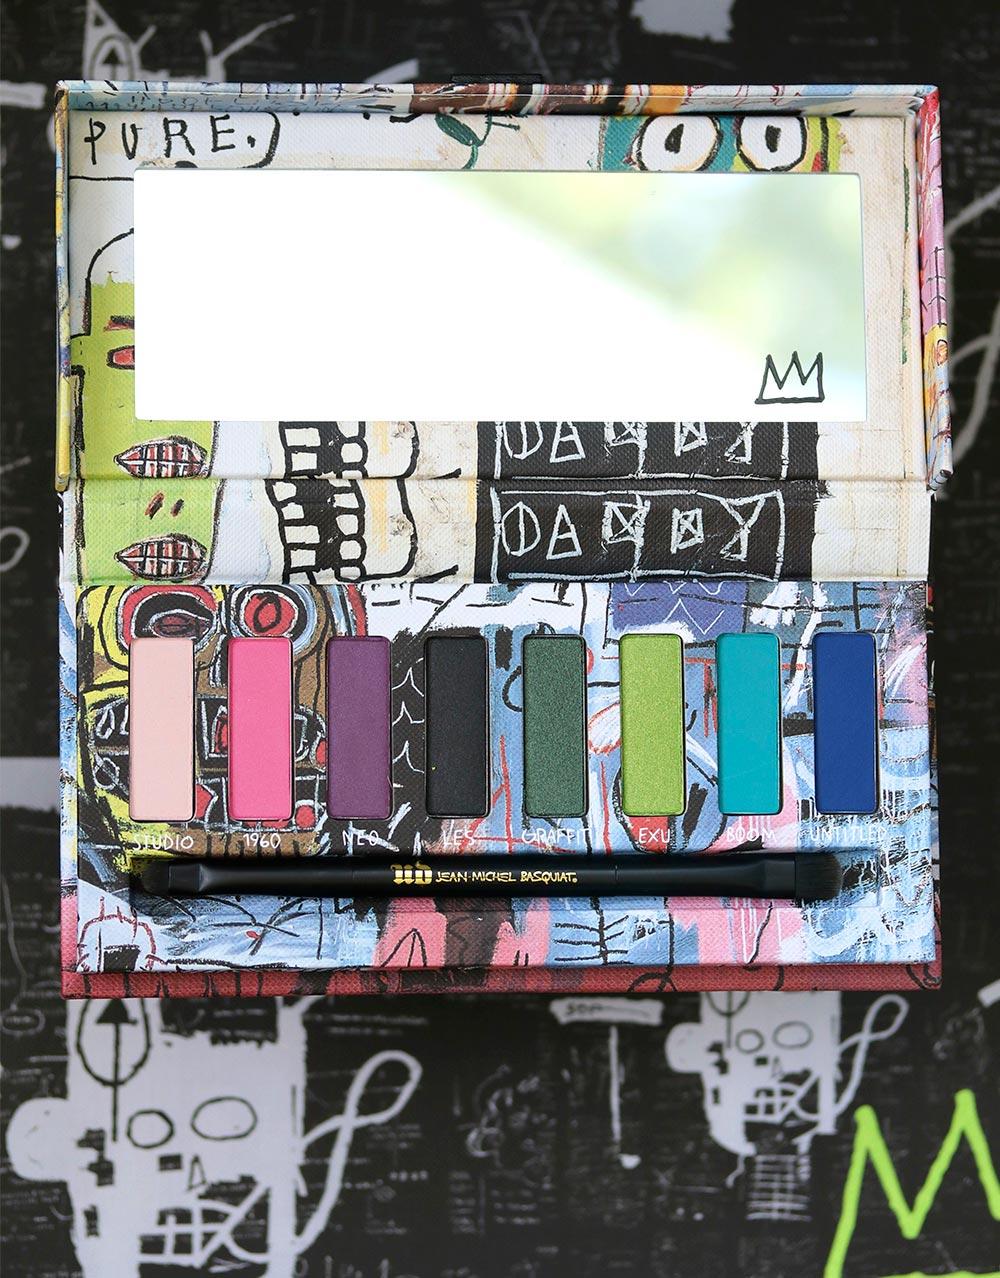 urban decay basquiat tenant palette 2